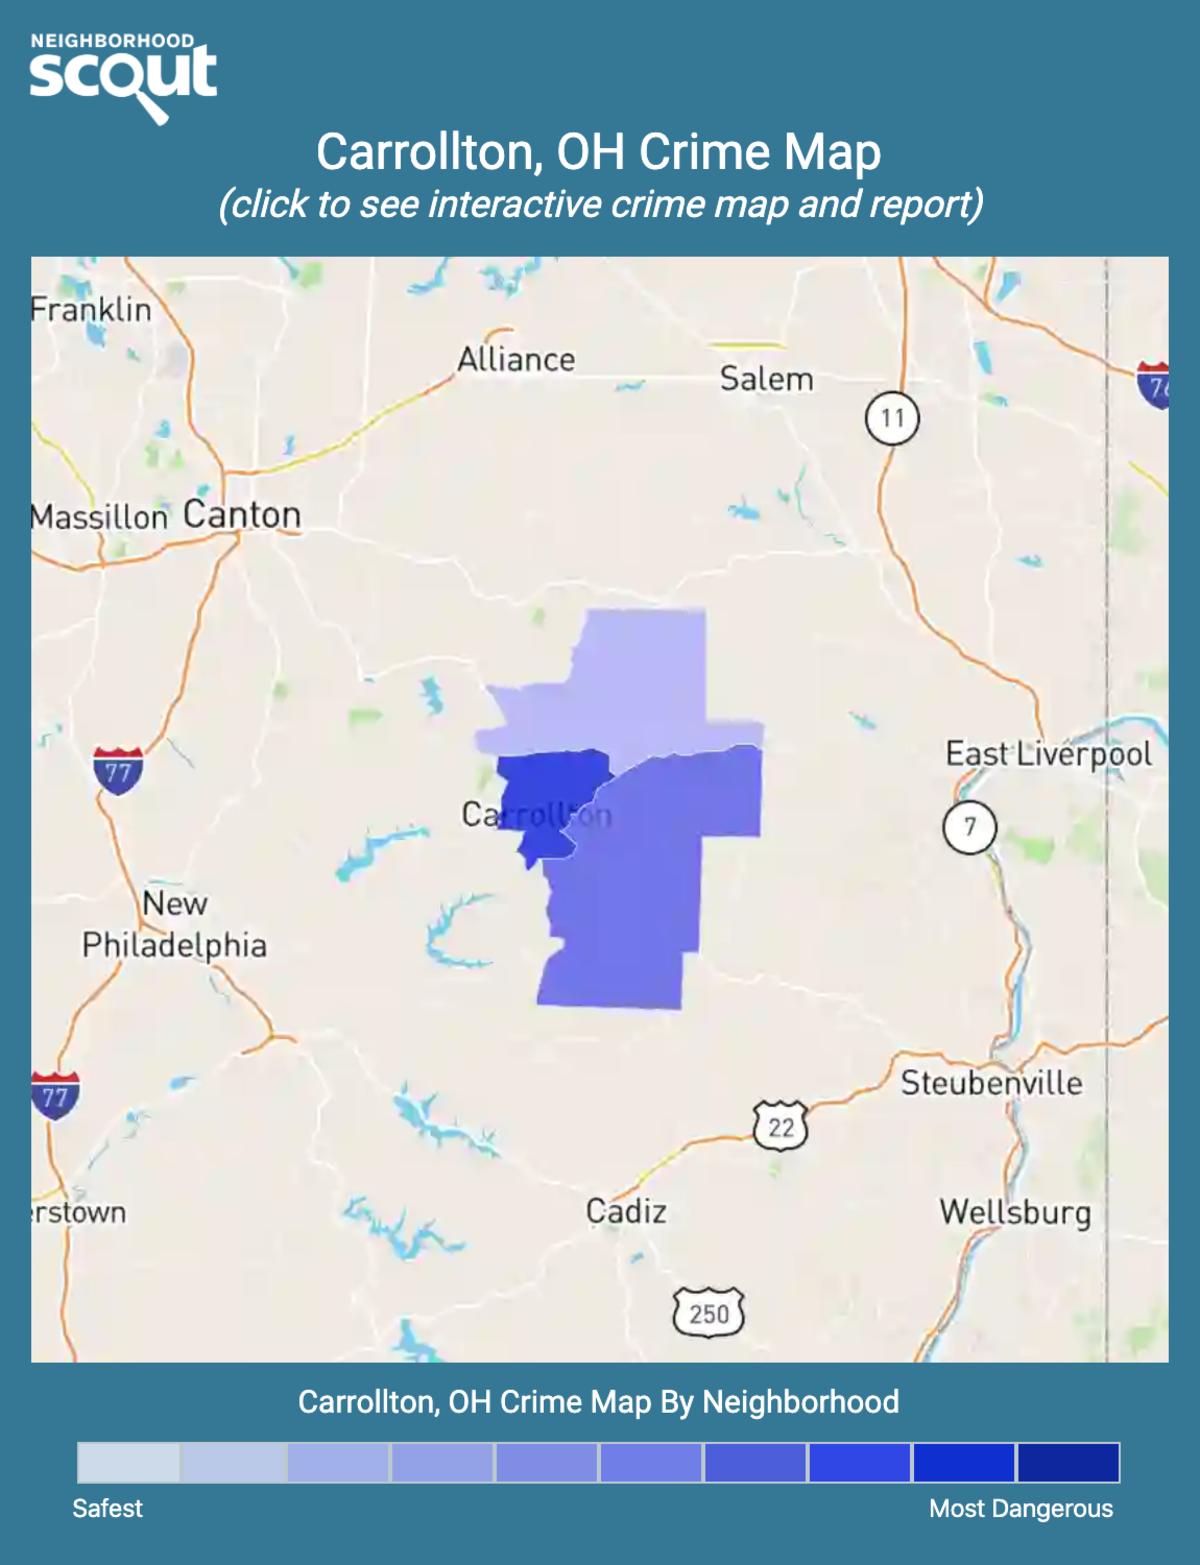 Carrollton, Ohio crime map